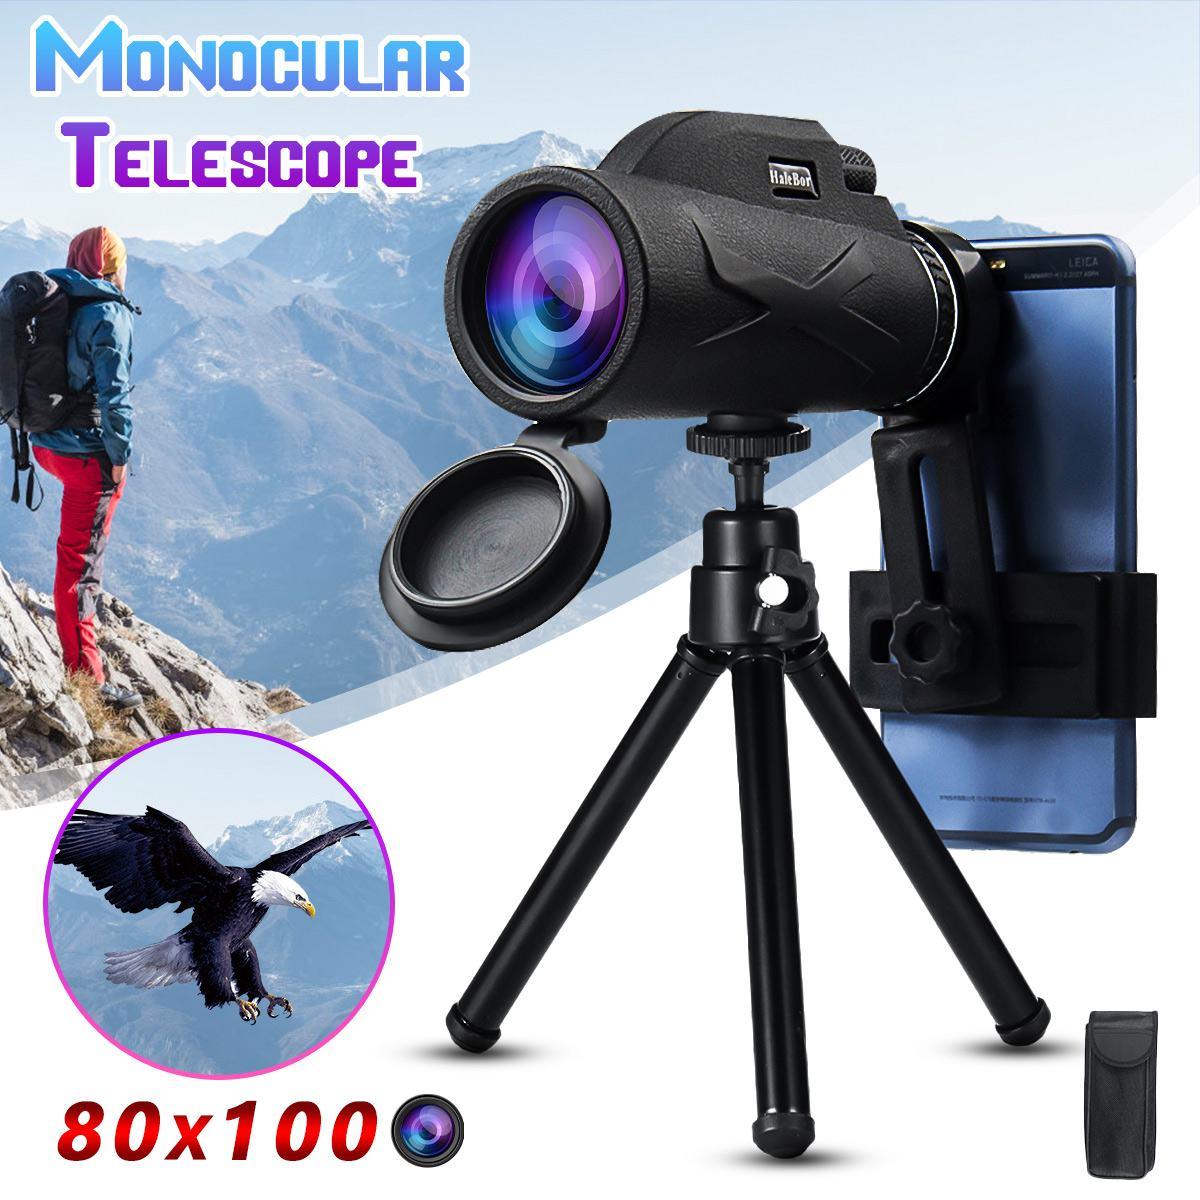 Telescopio profesional Monocular 80x10 0/50x60, telescopio potente para móvil, ocular militar, objetivo de mano, óptica de caza